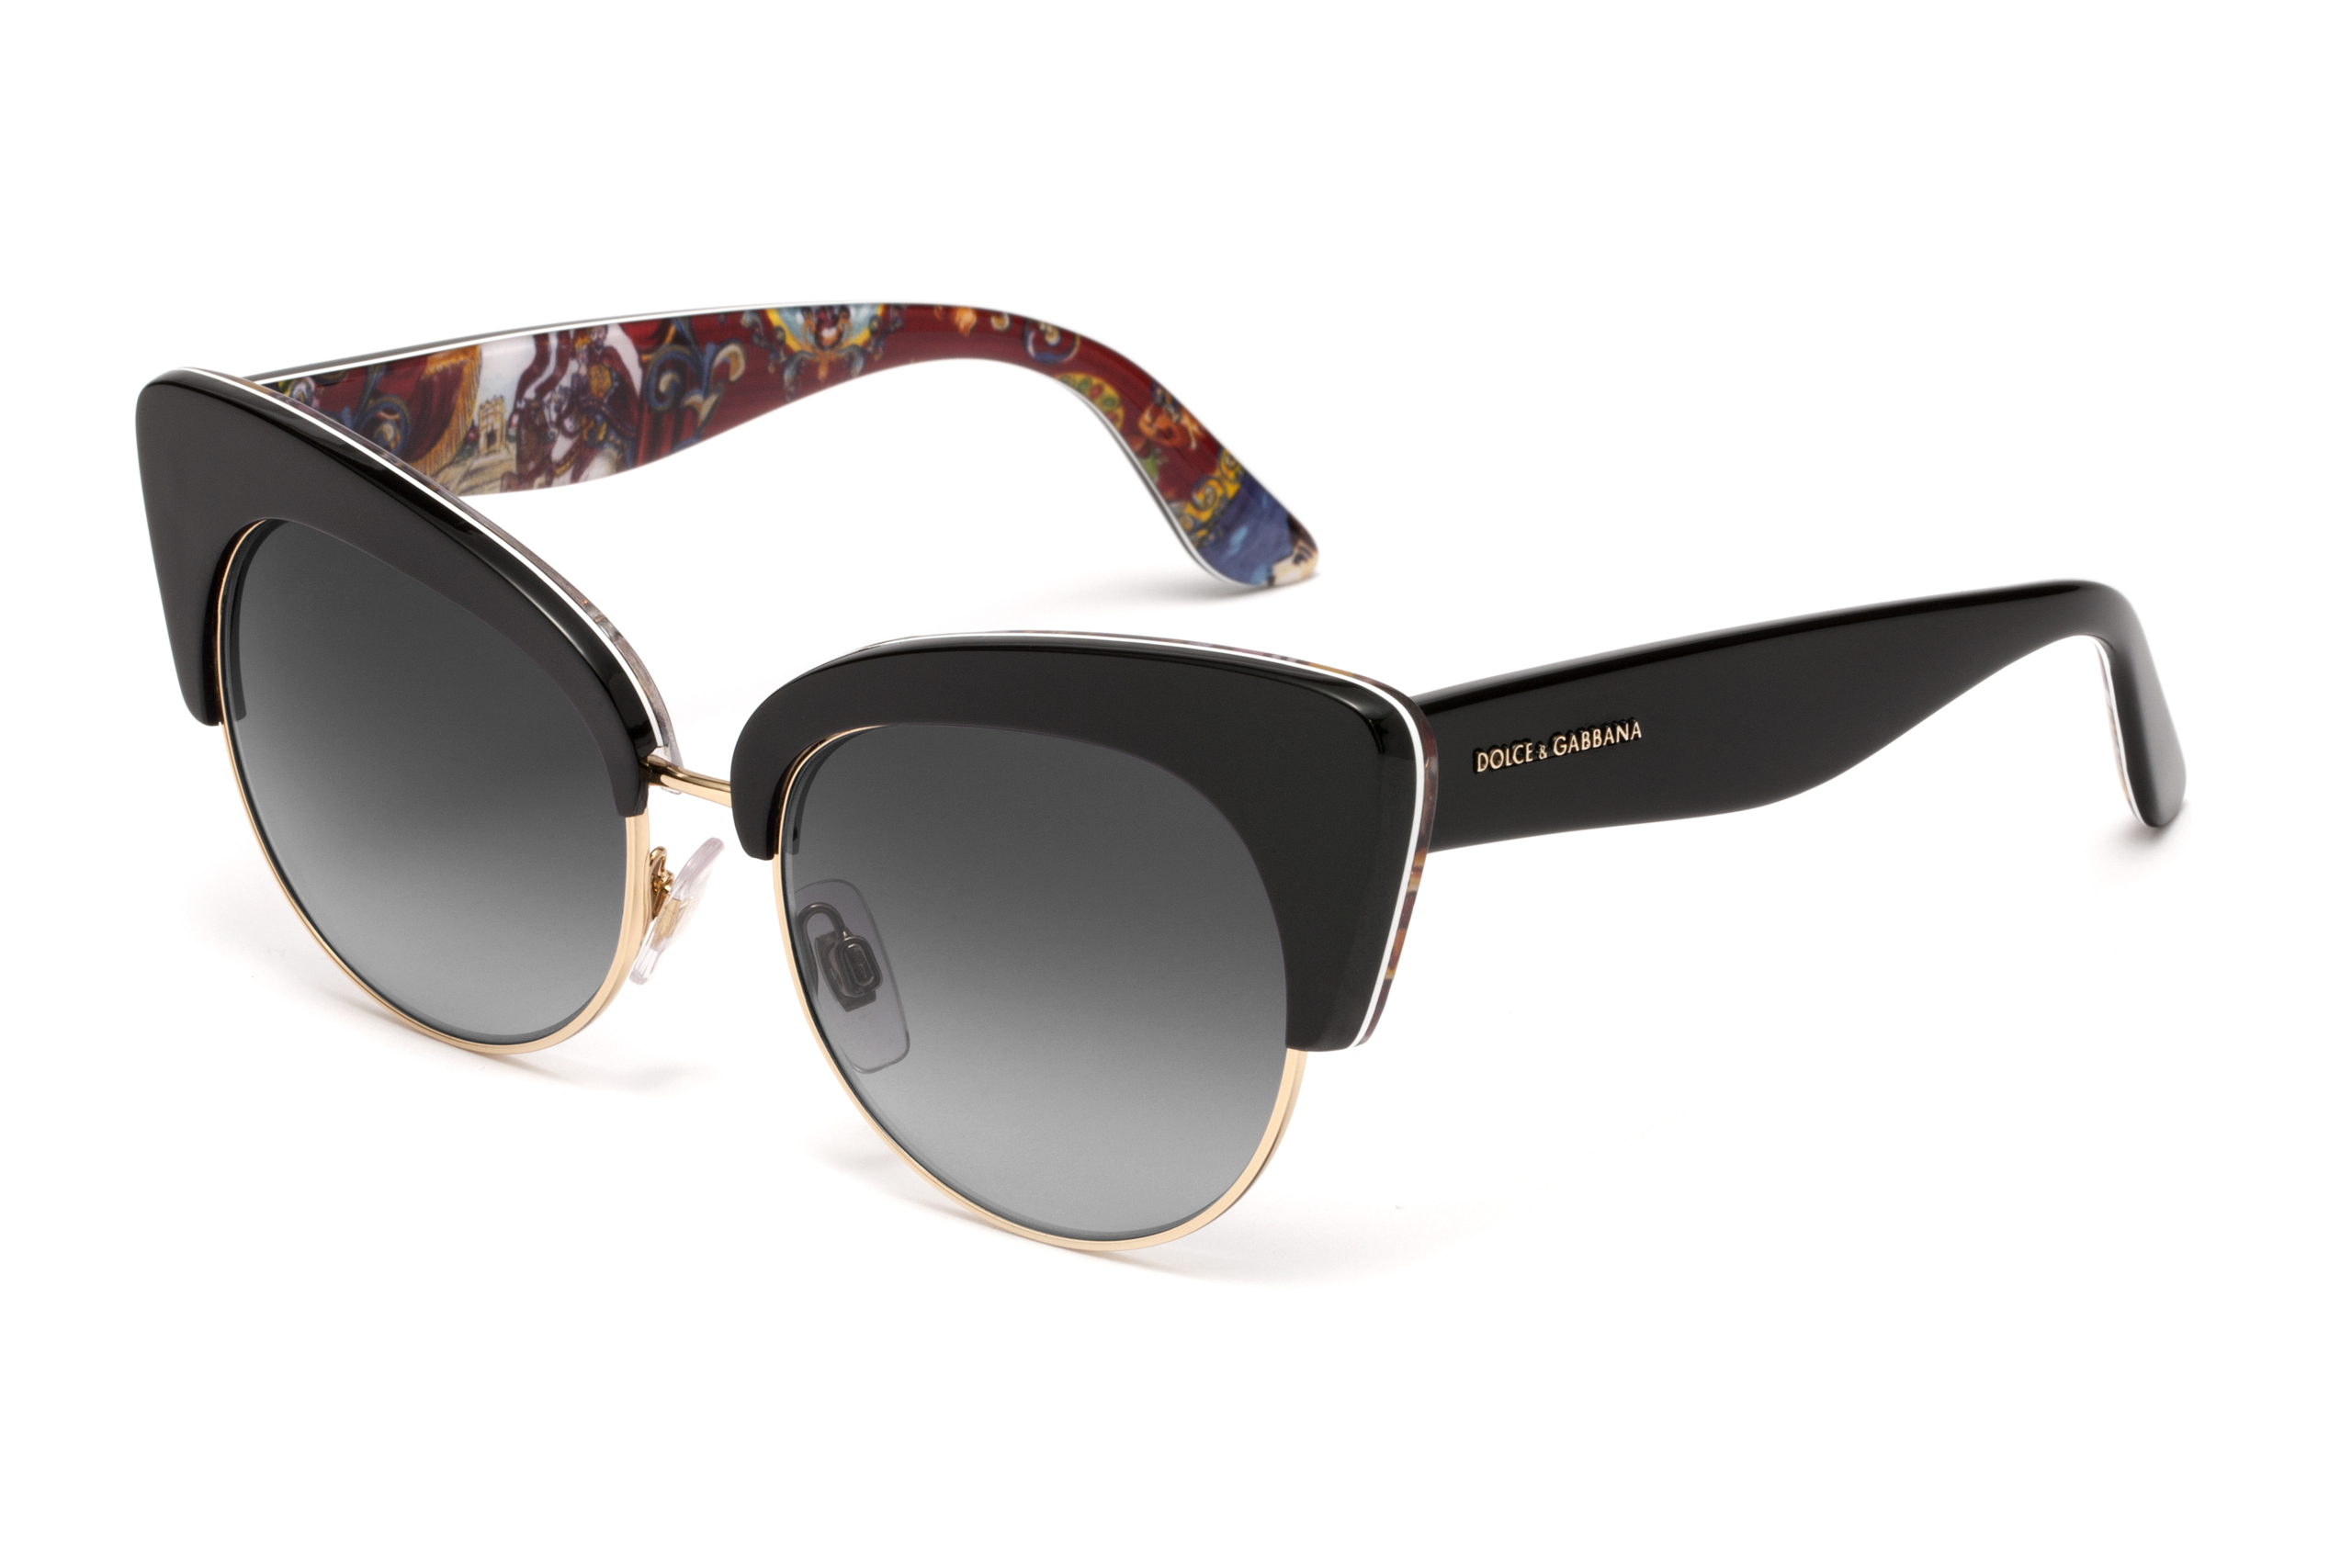 2761279c9c gafas de sol dolce gabbana